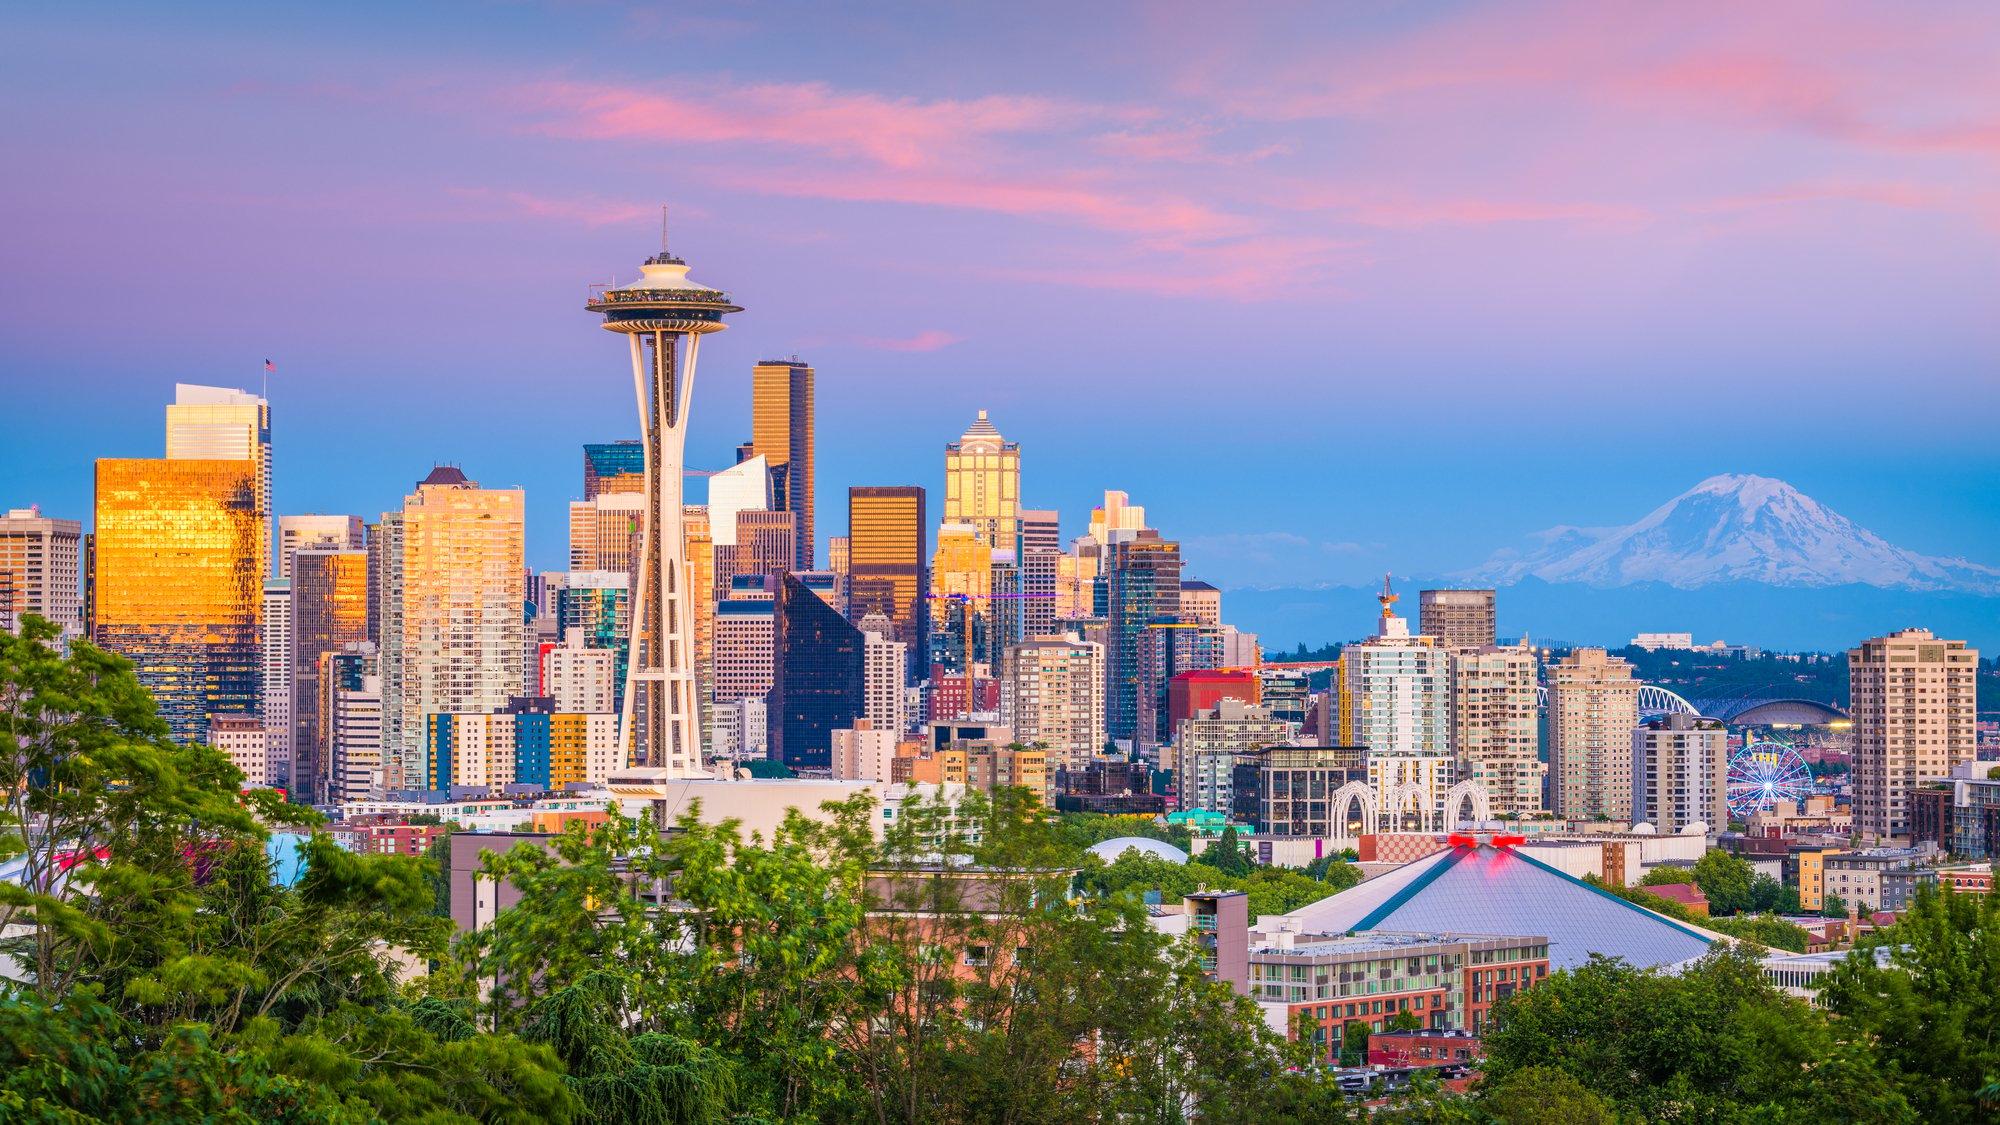 Seattle, Washington, USA downtown skyline at night with Mt. Rainier